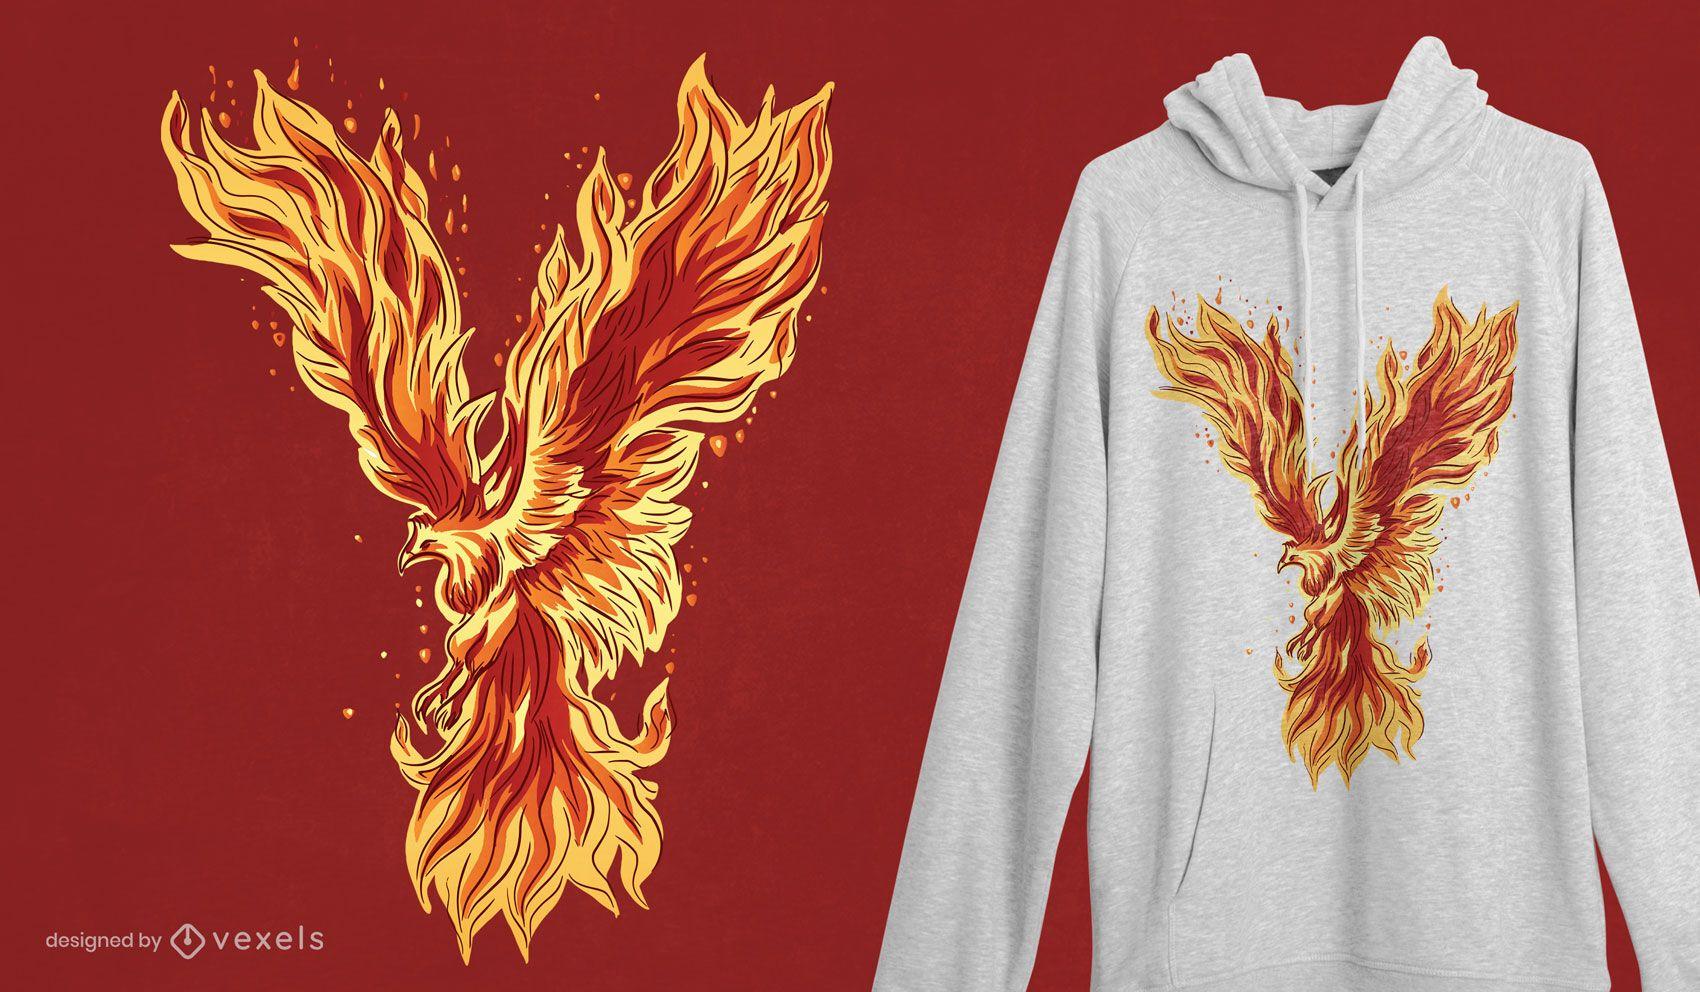 Phoenix creature t-shirt design